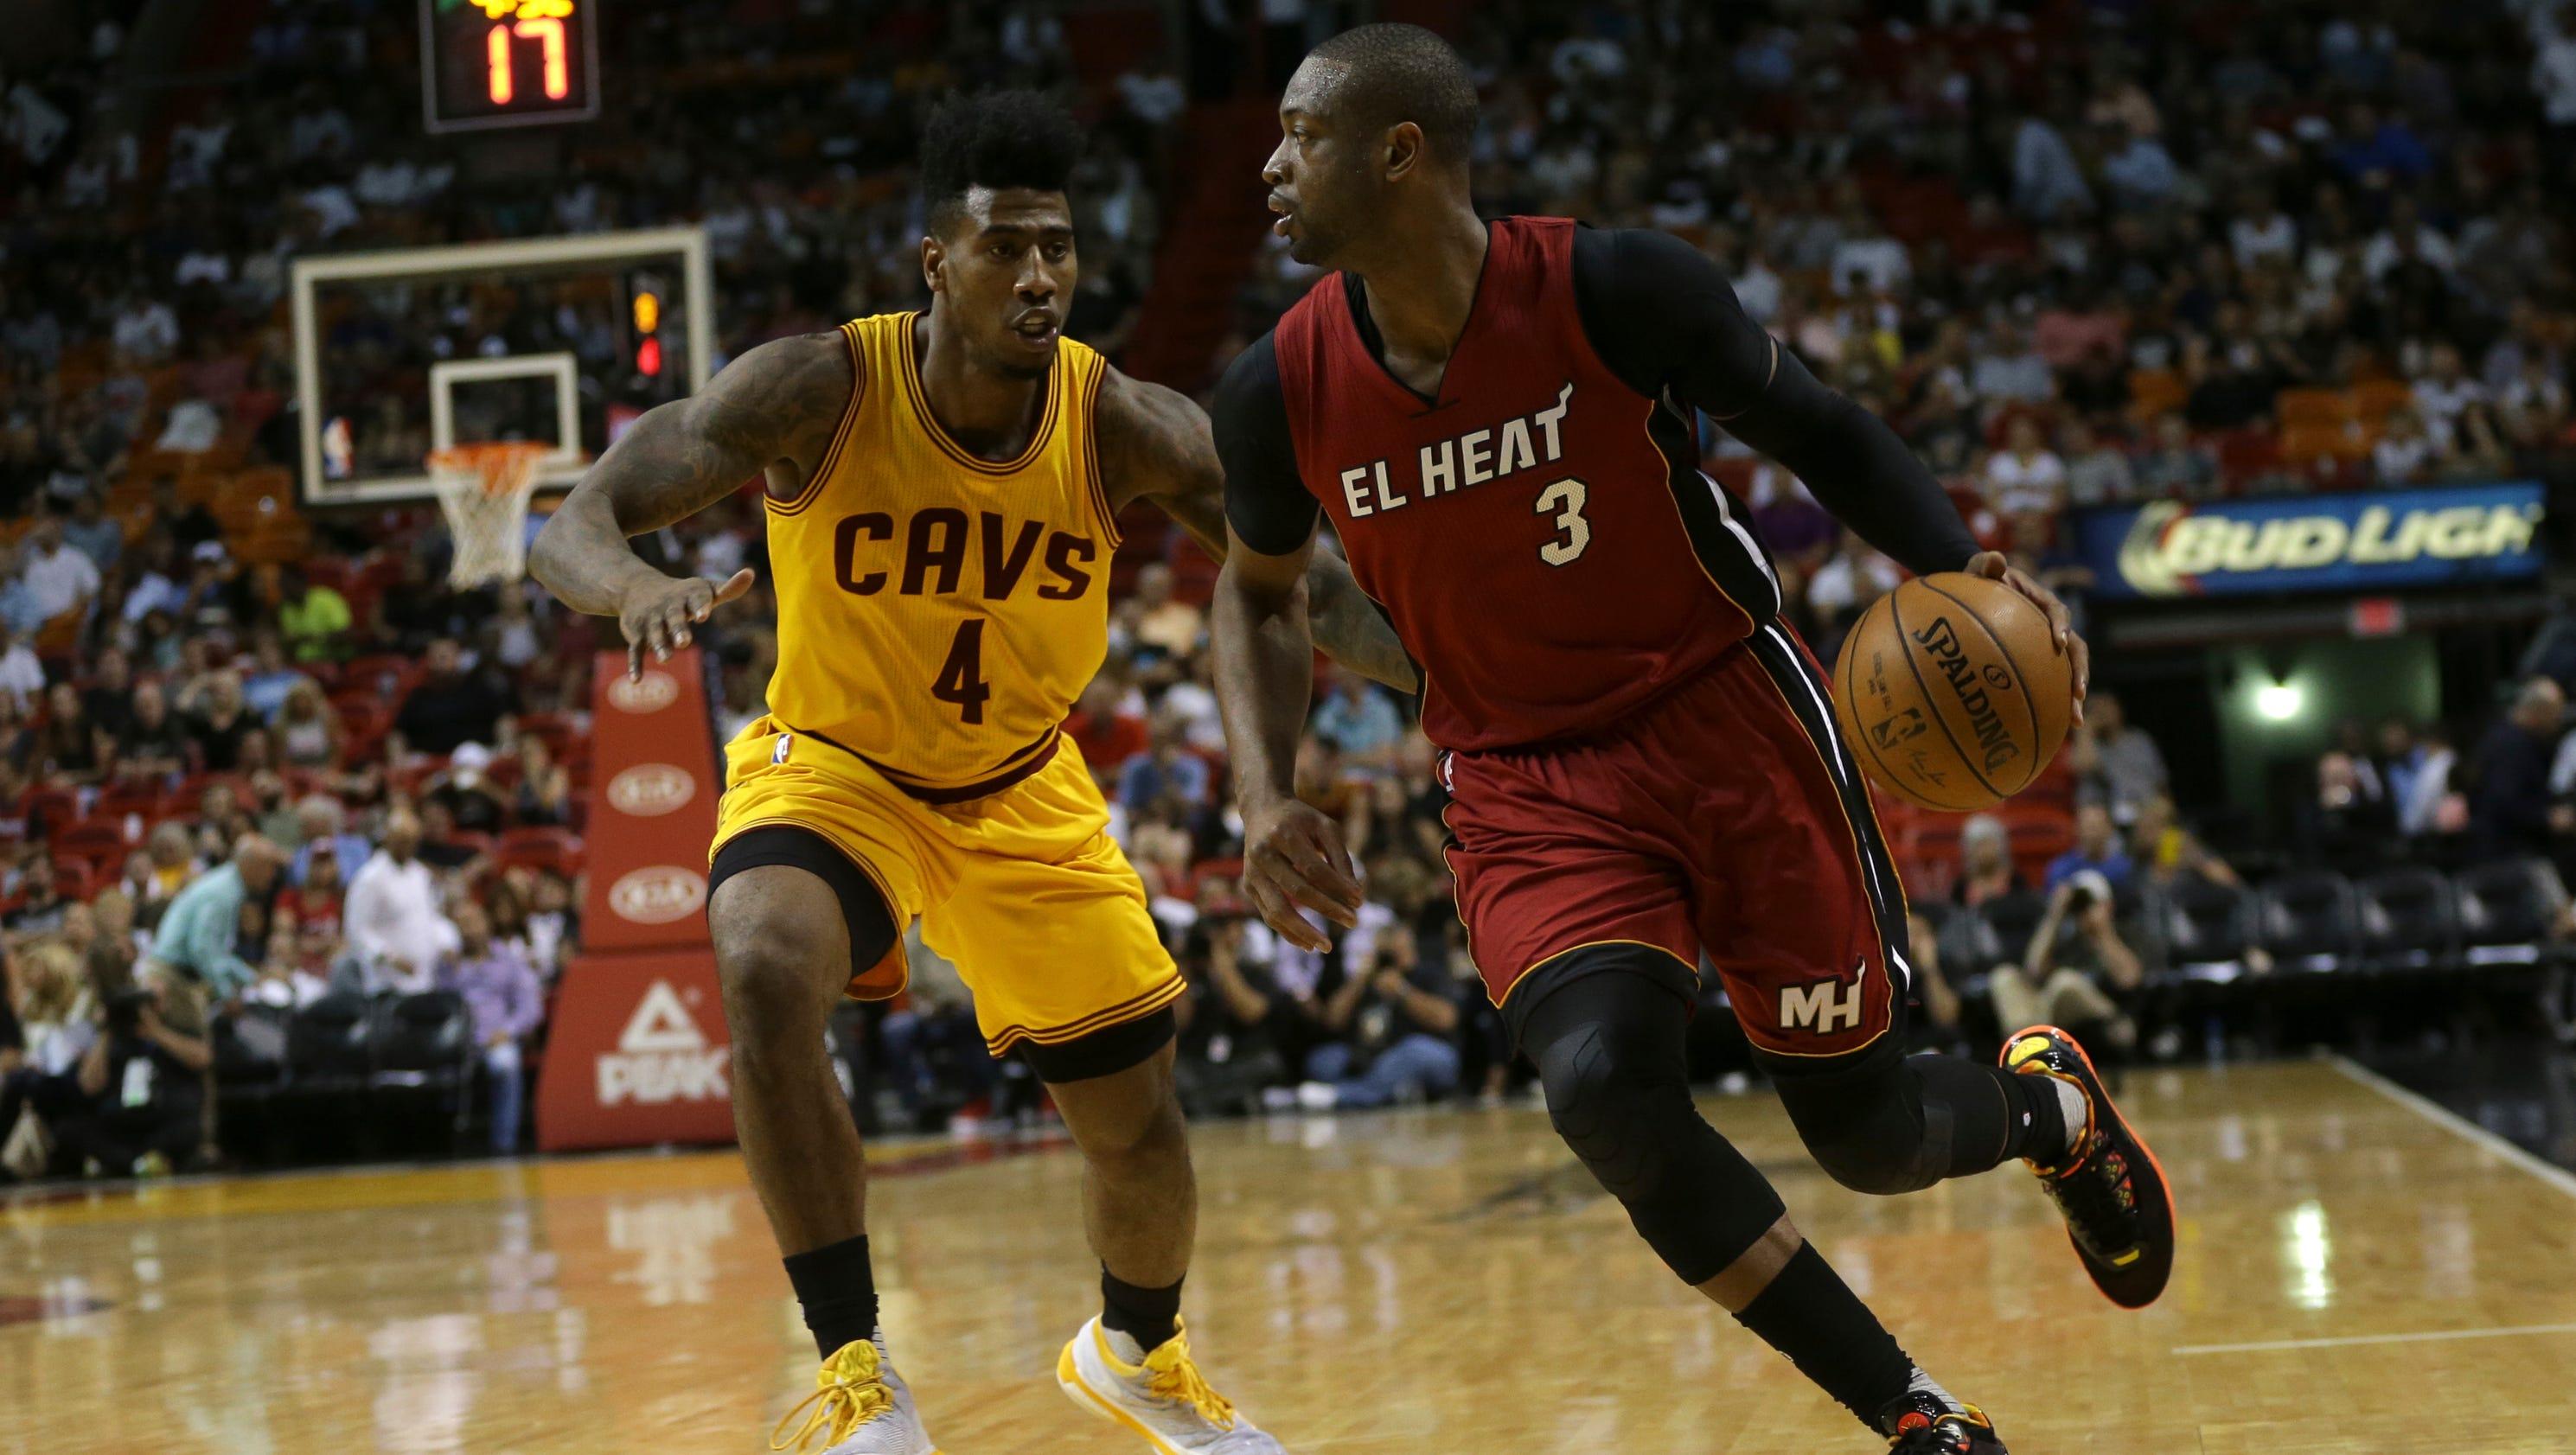 http://www.gannett-cdn.com/-mm-/49eaba904552dd99c2695aa7156da9cc68f4d610/c=0-117-3461-2072&r=x1683&c=3200x1680/local/-/media/2016/03/19/USATODAY/USATODAY/635940269564734279-AP-Cavaliers-Heat-Basketball.jpg